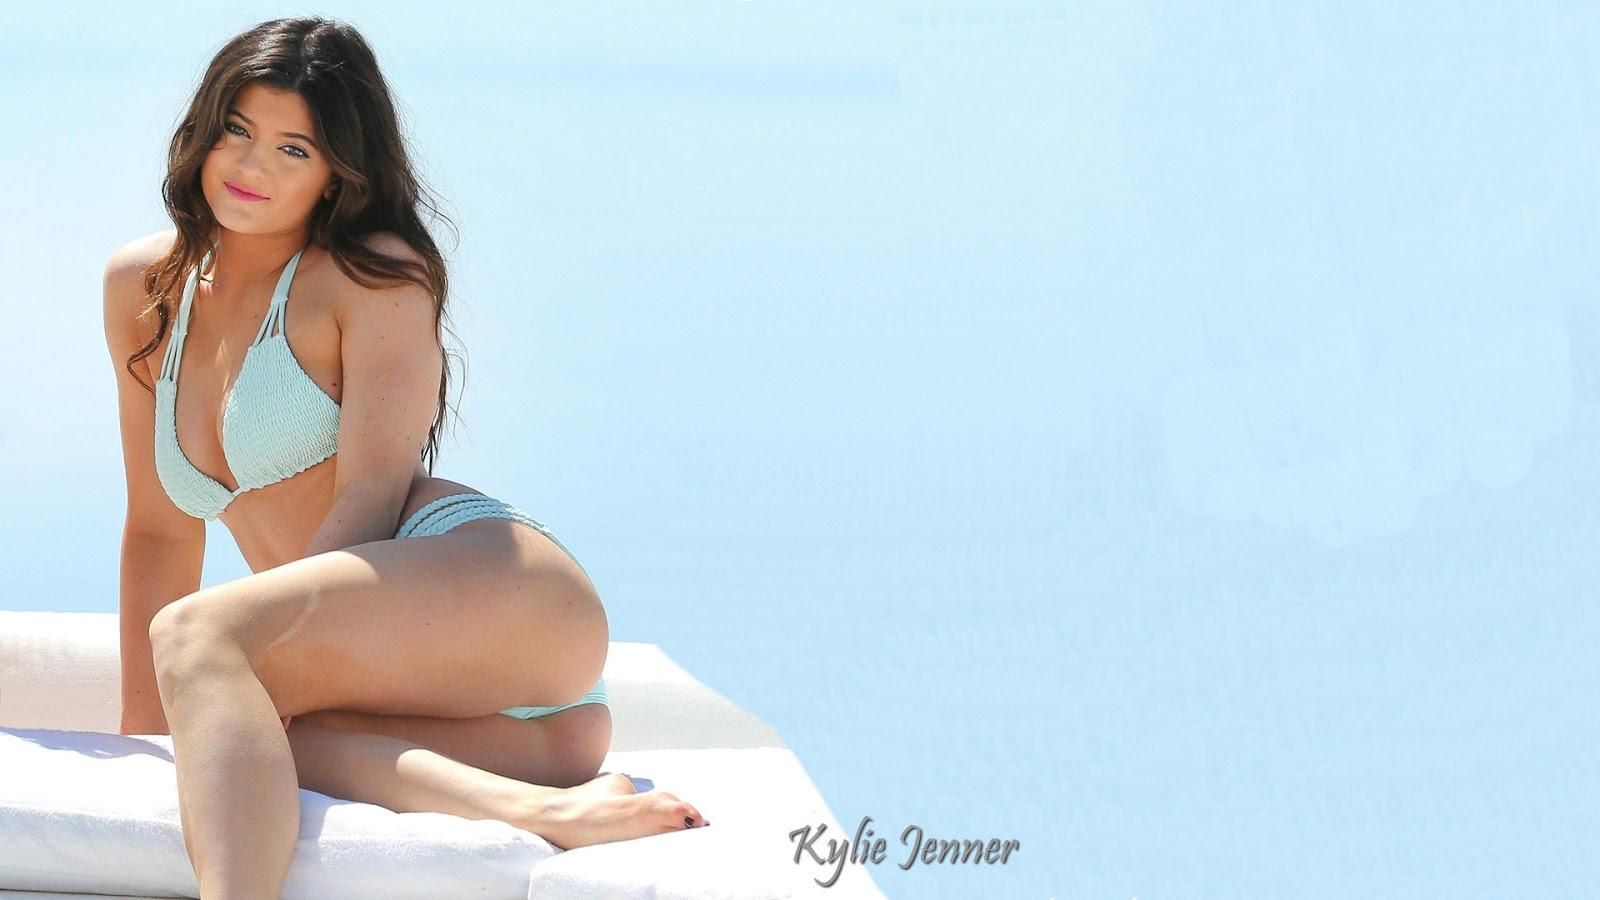 Kylie Jenner High Resolution